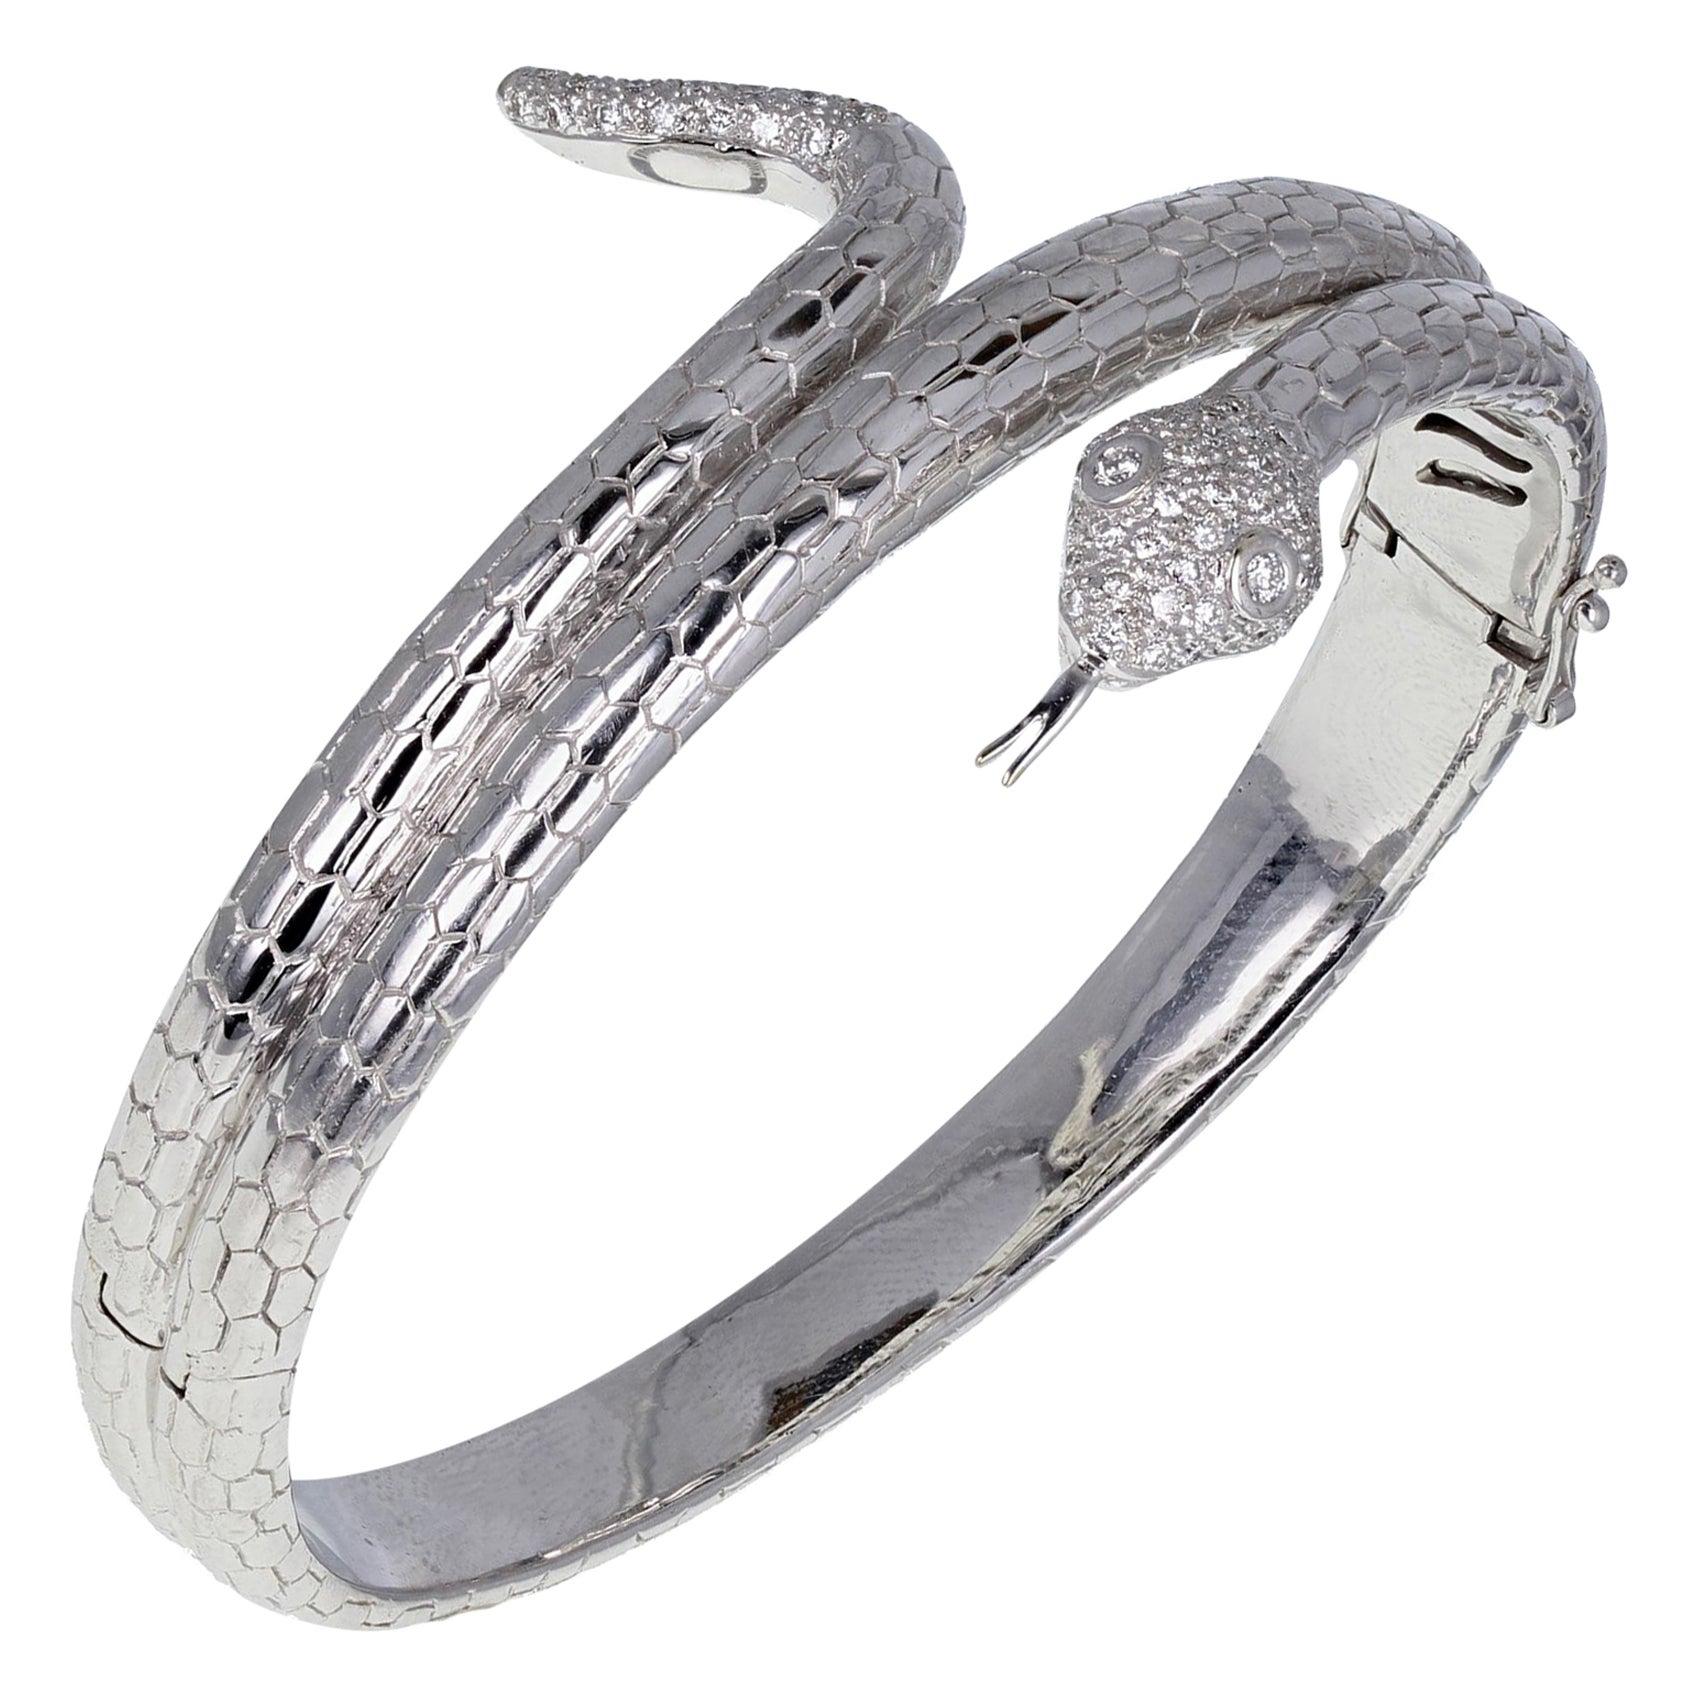 18 Carat White Gold Diamond Snake Serpent Bangle Bracelet